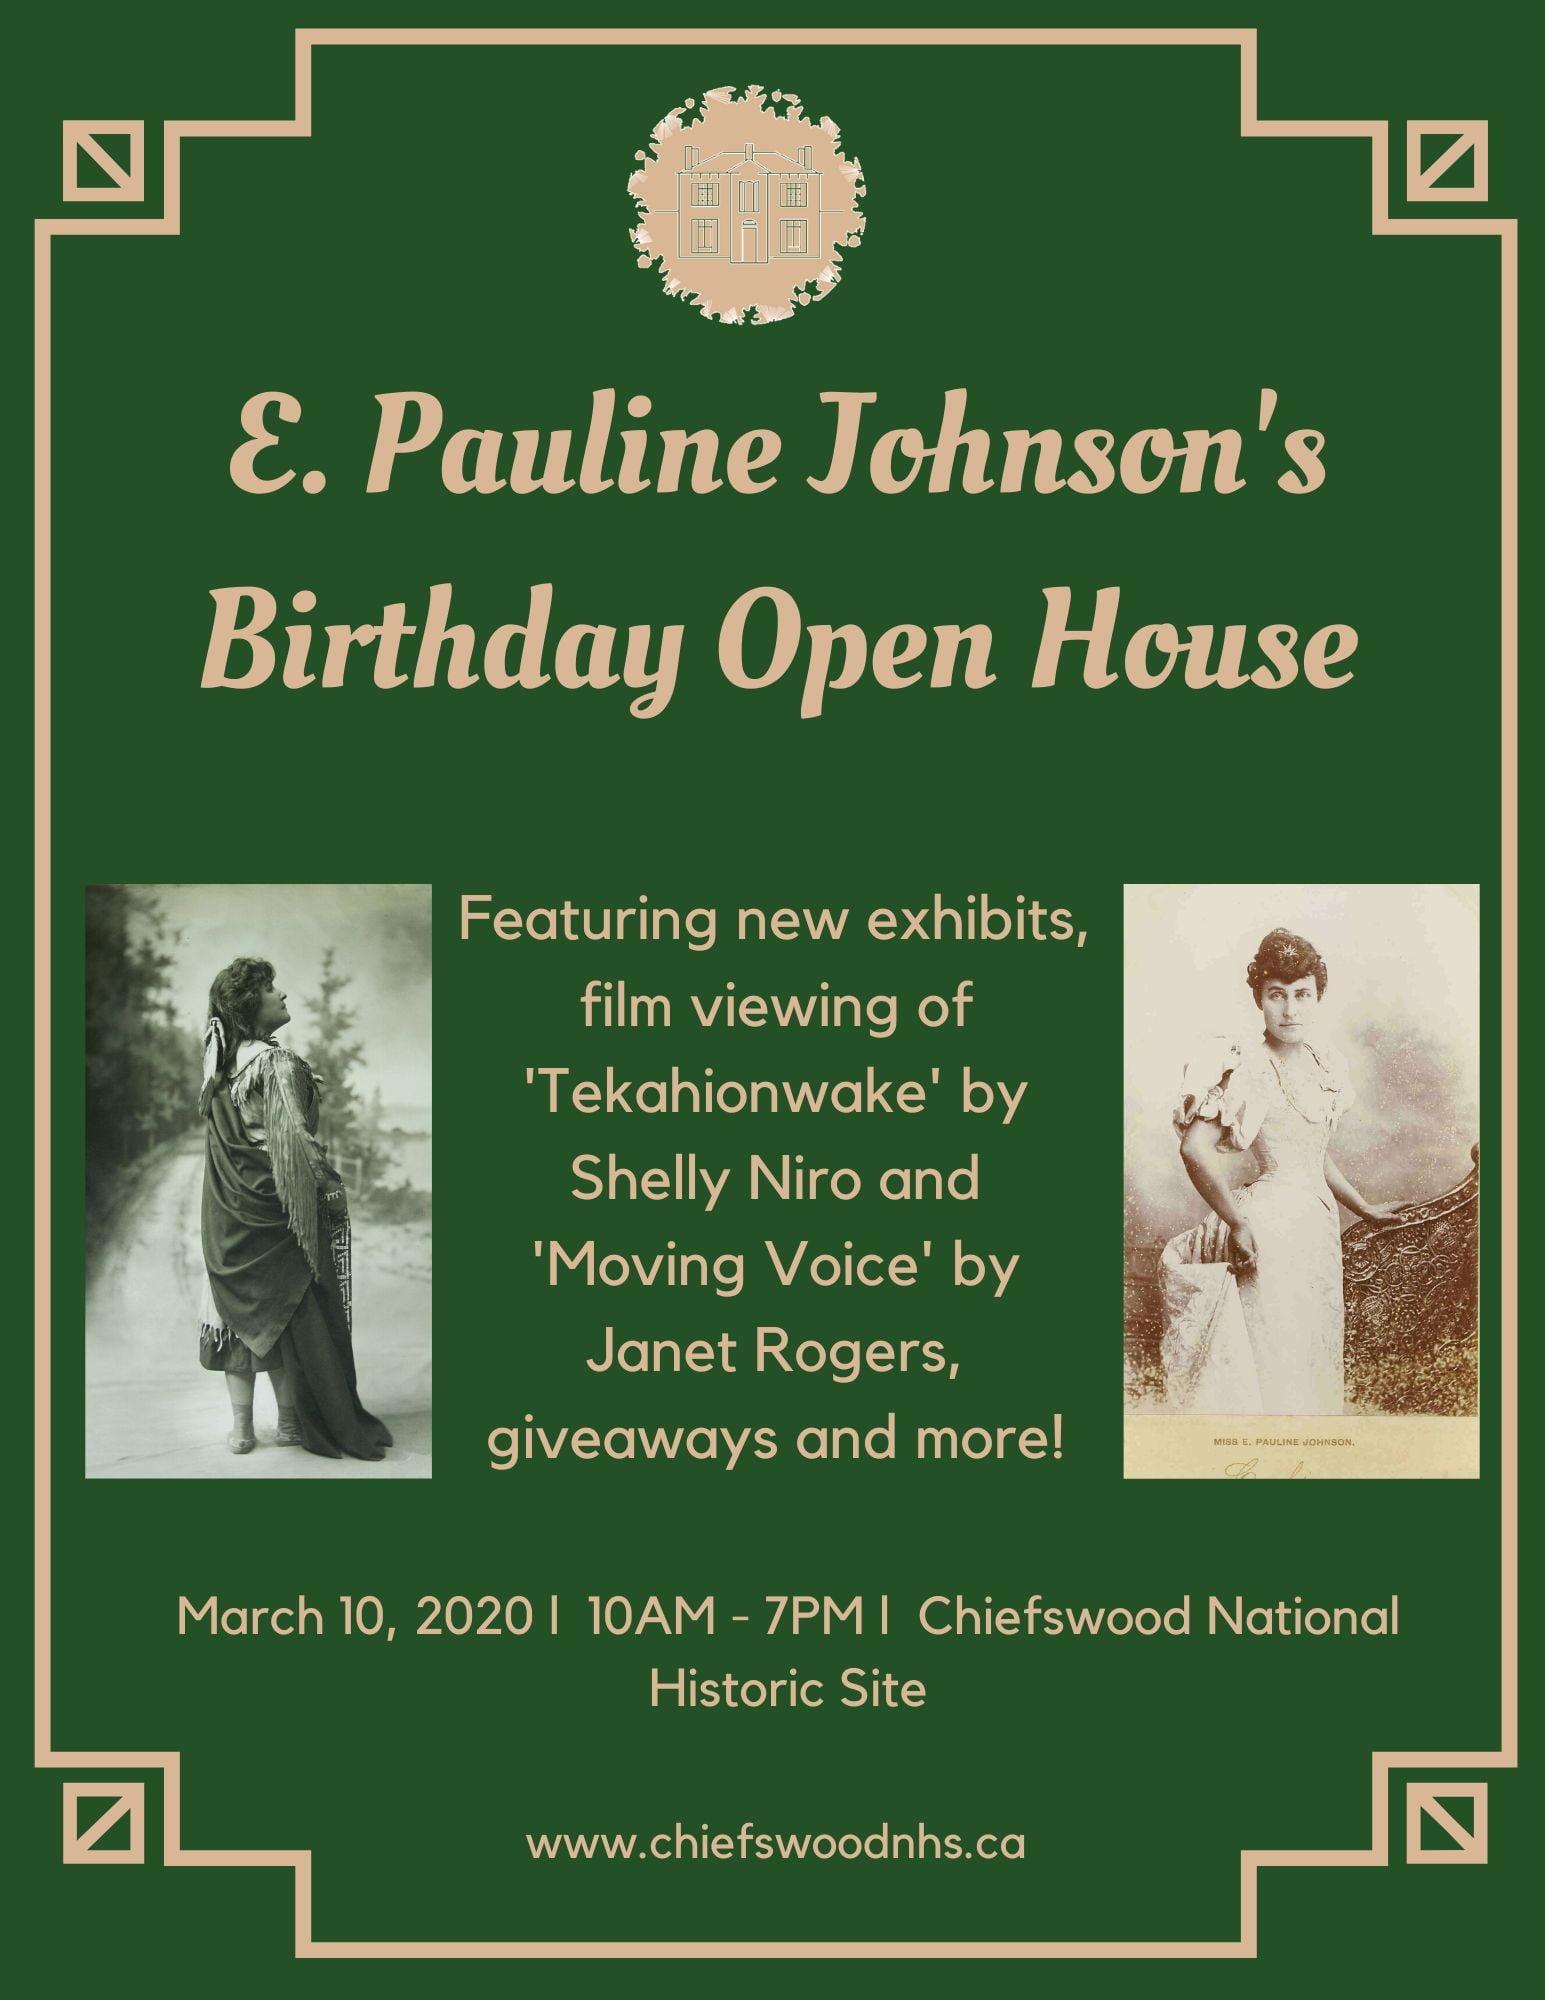 Celebration of E. Pauline Johnson